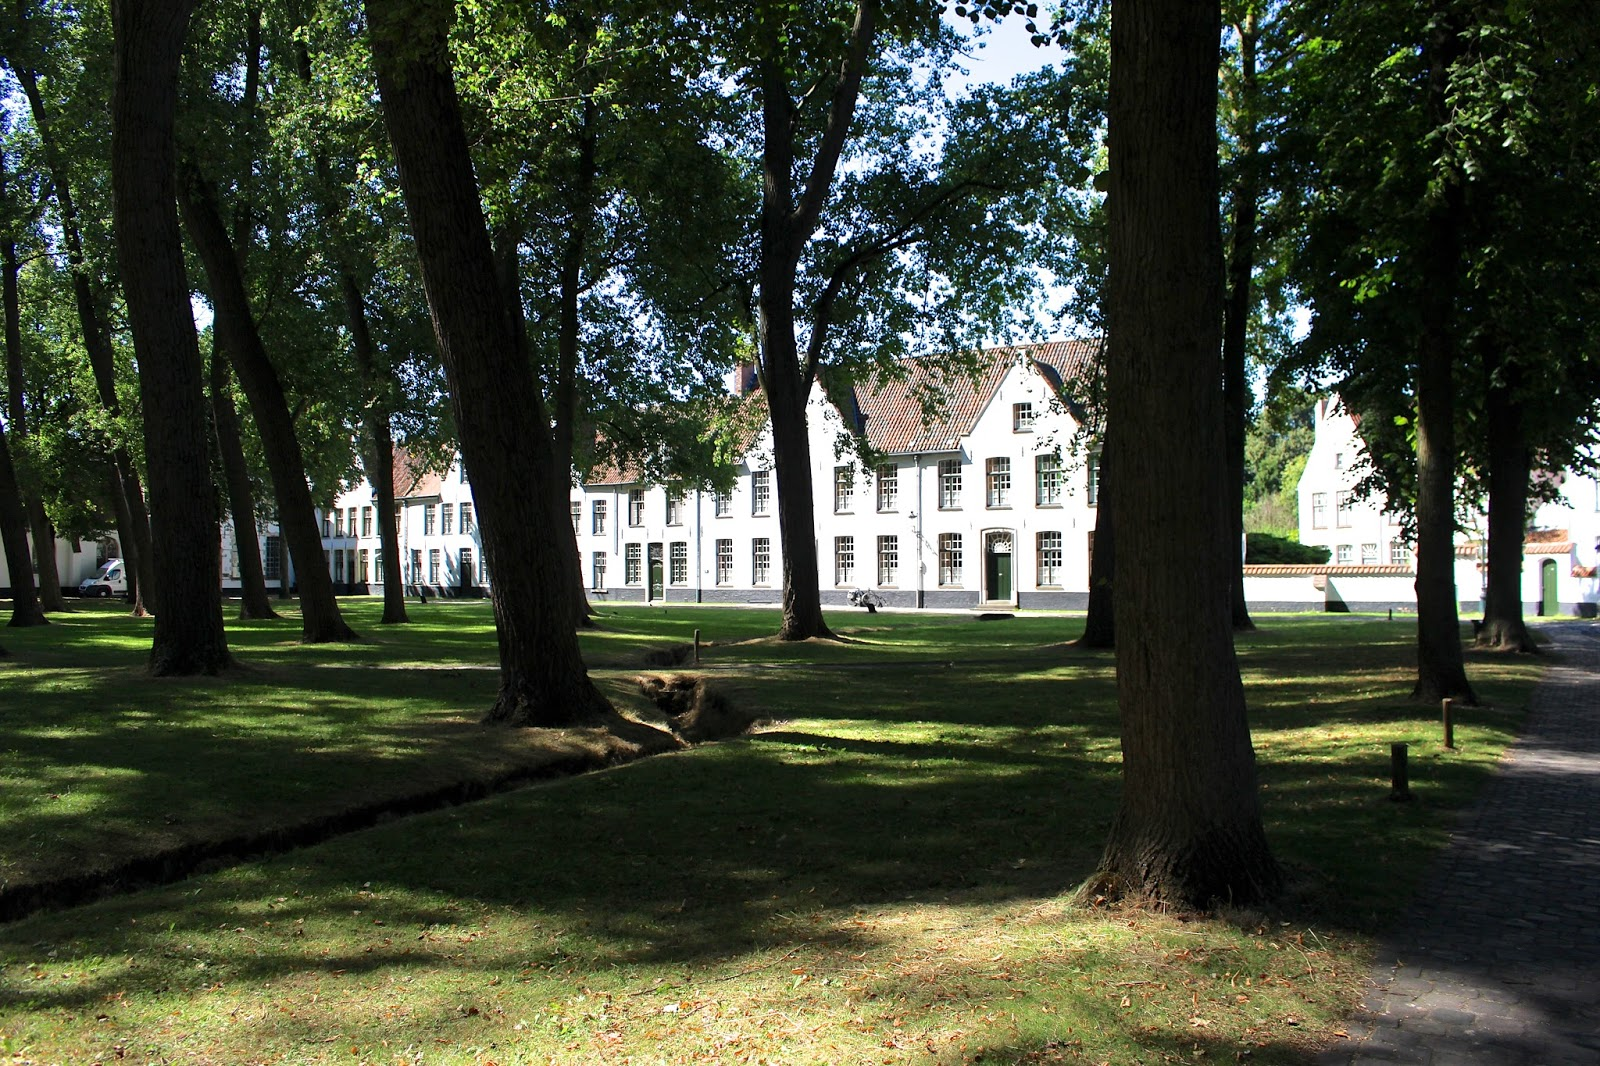 Begijnhof in Bruges Belgium silent order of nuns